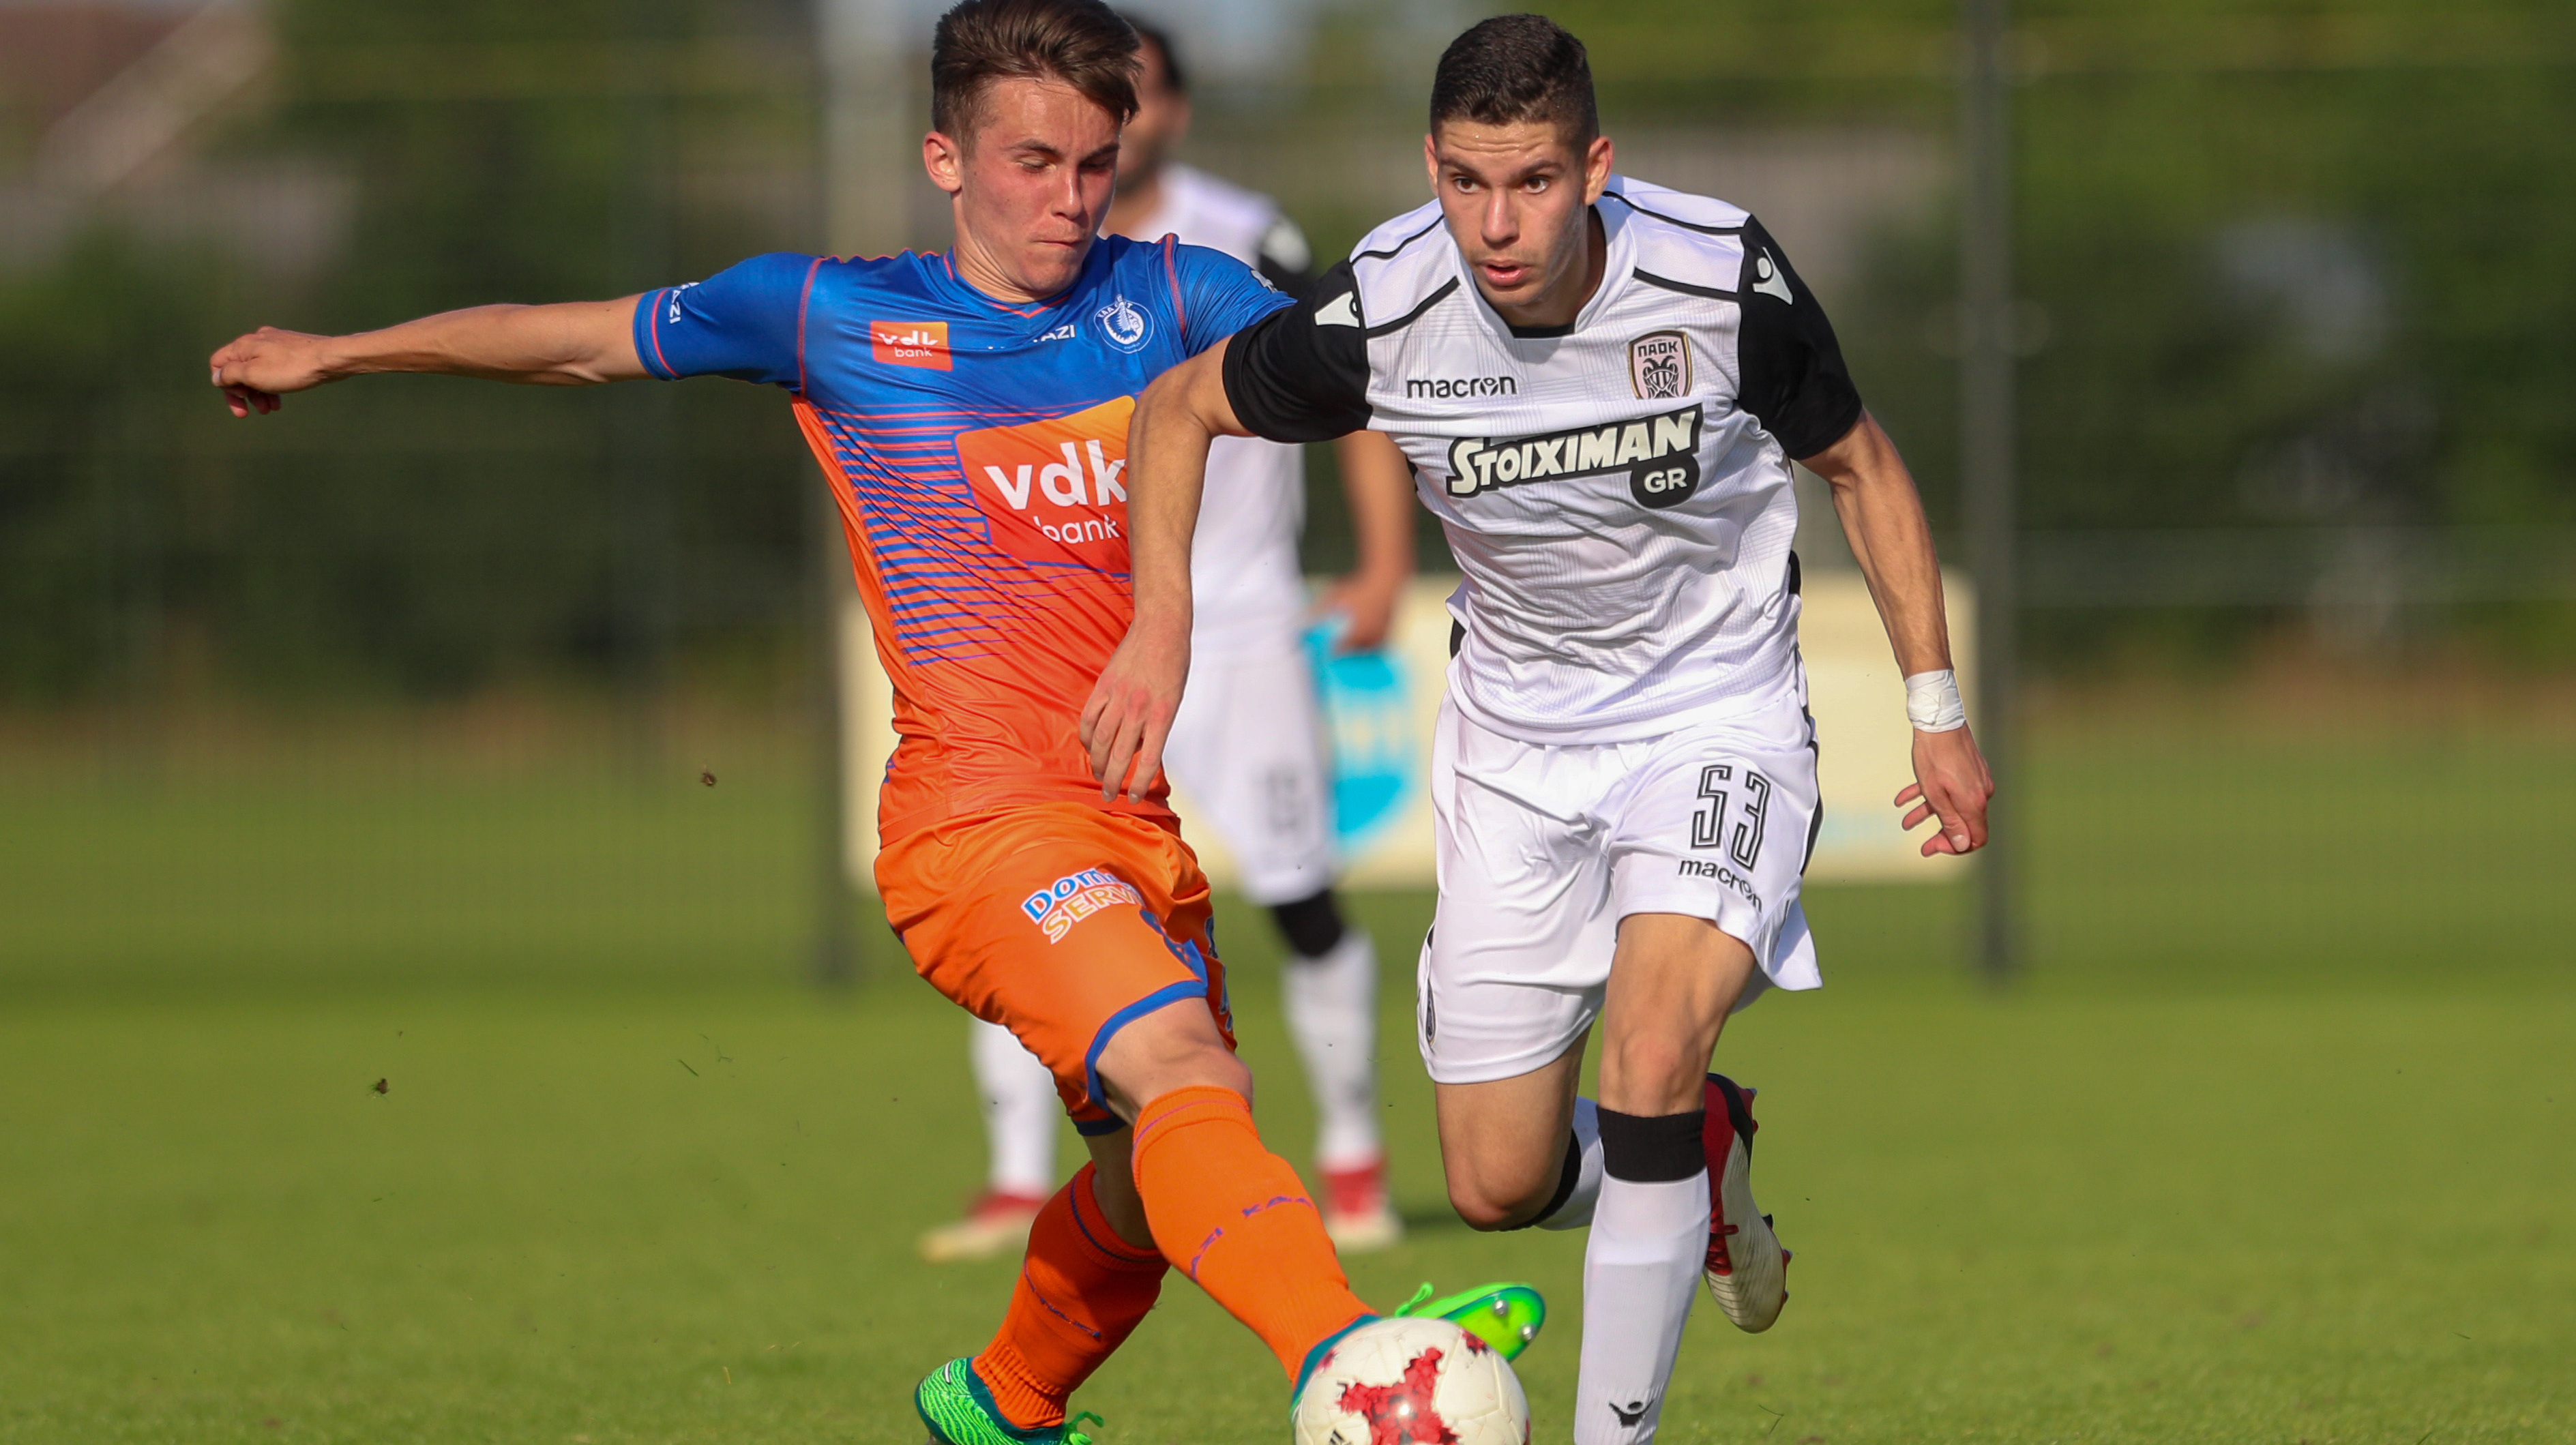 PAOK – KAA Ghent U23: Highlights